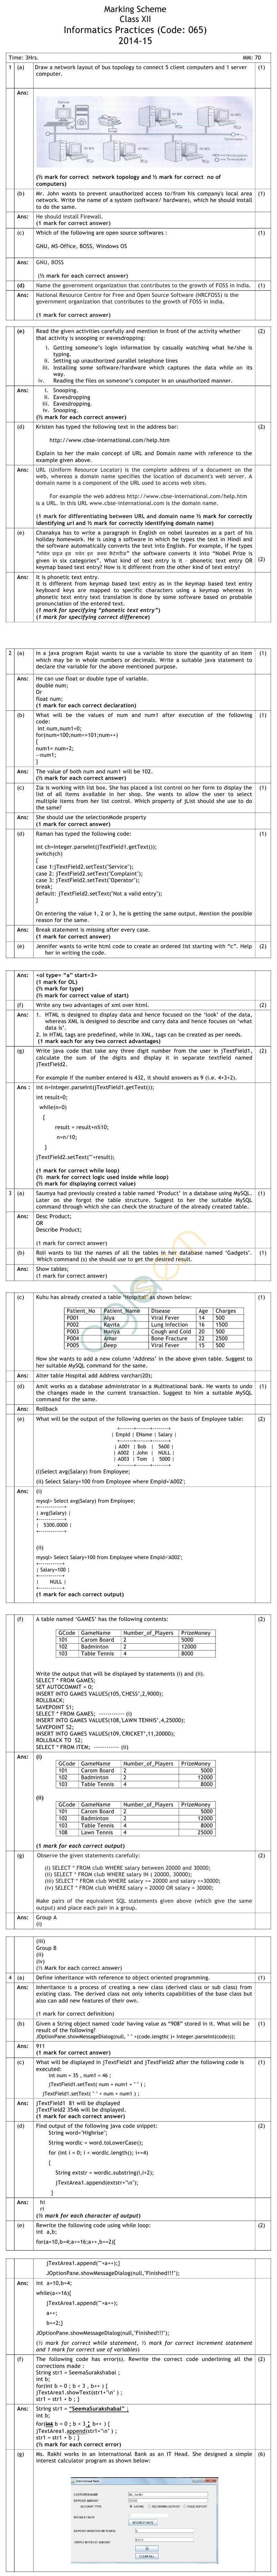 CBSE Class XII Marking Scheme 2015 Informatics Practices